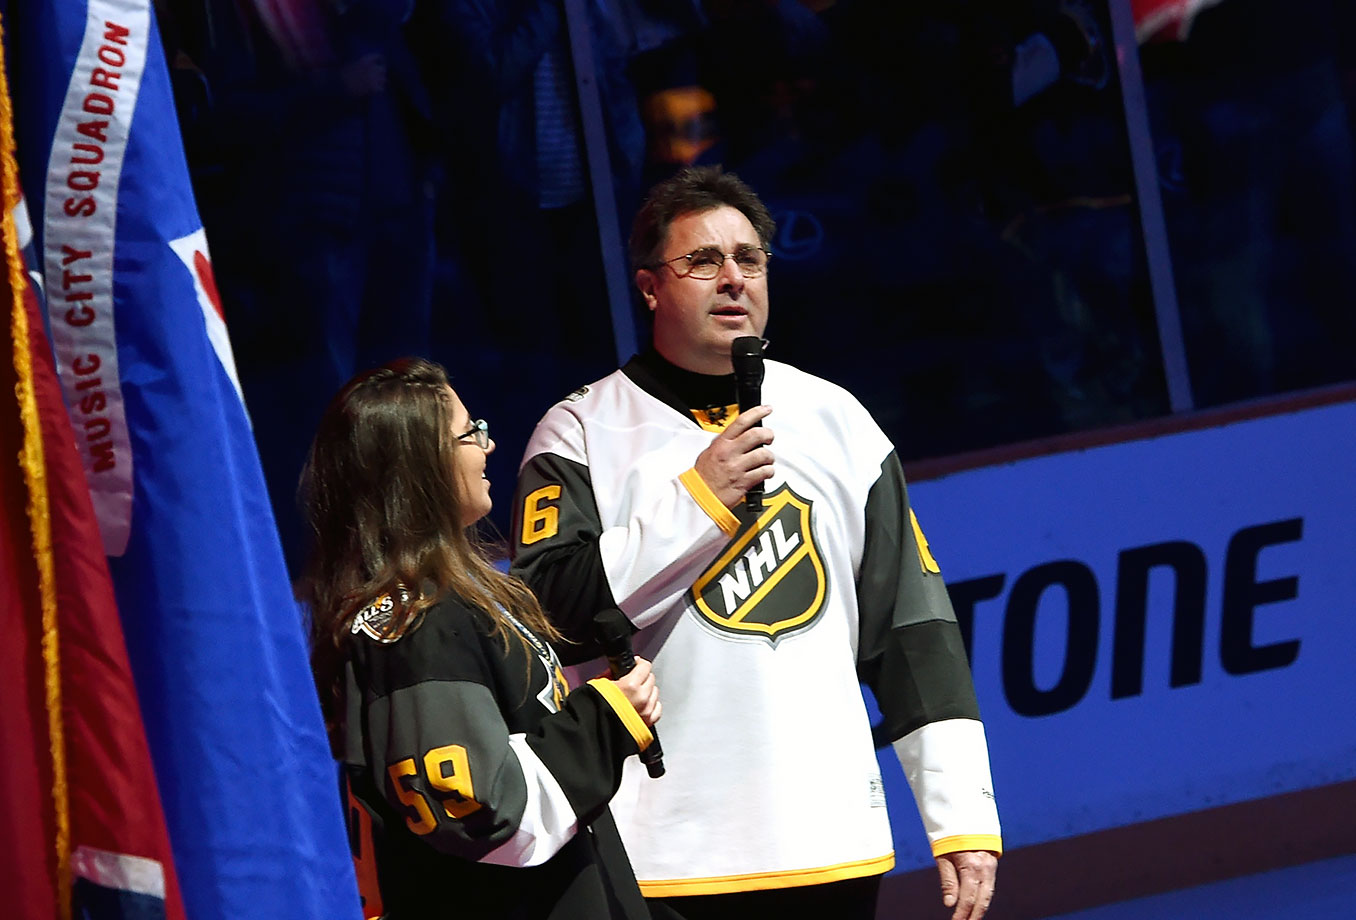 NHL All-Star Game on January 31, 2016 at Bridgestone Arena in Nashville.